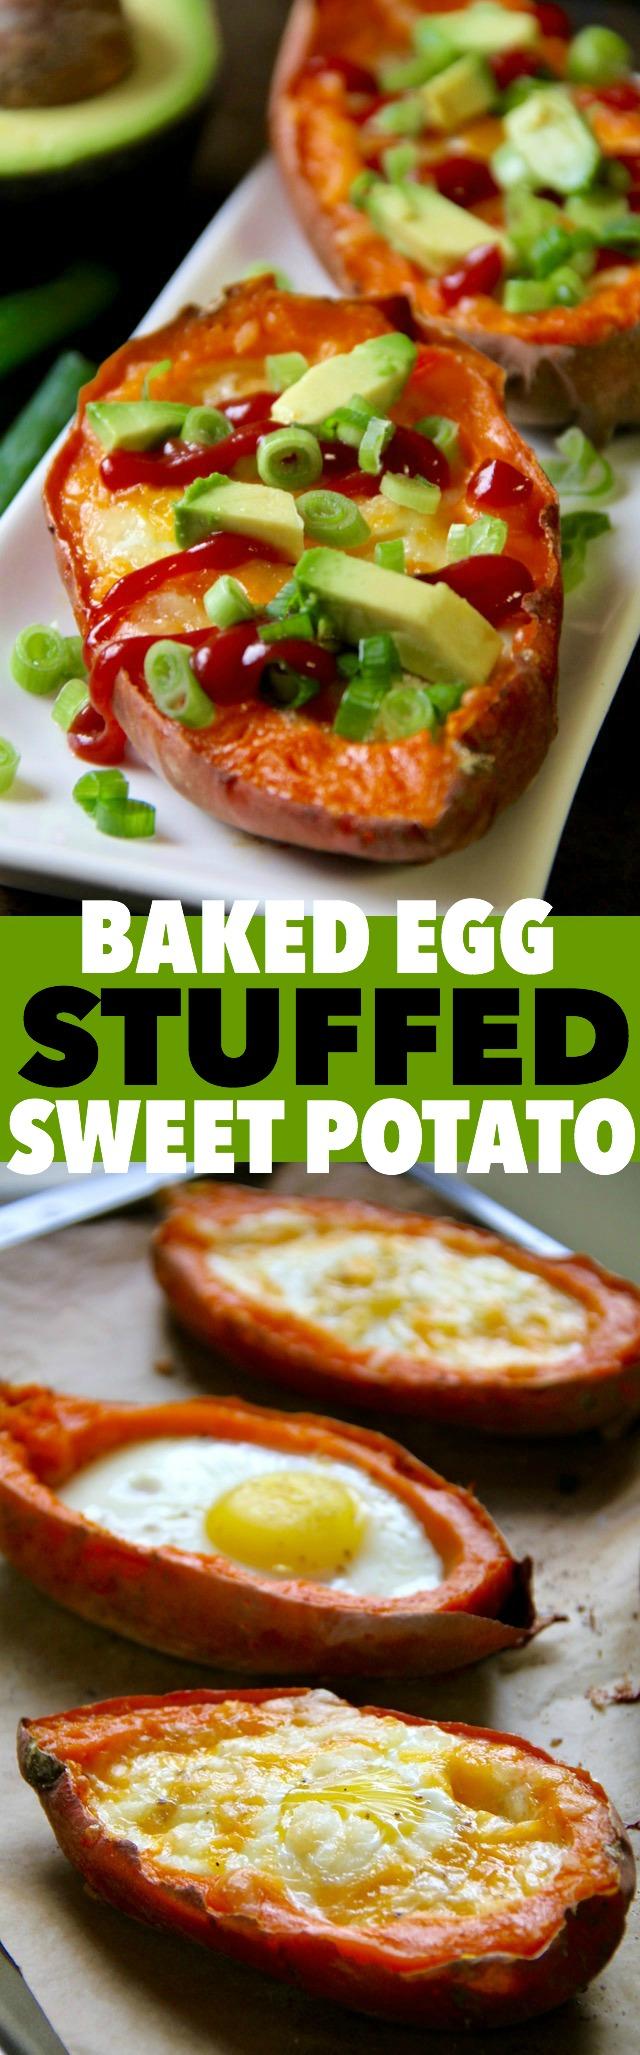 Baked-Egg-Stuffed-Sweet-Potatoes5